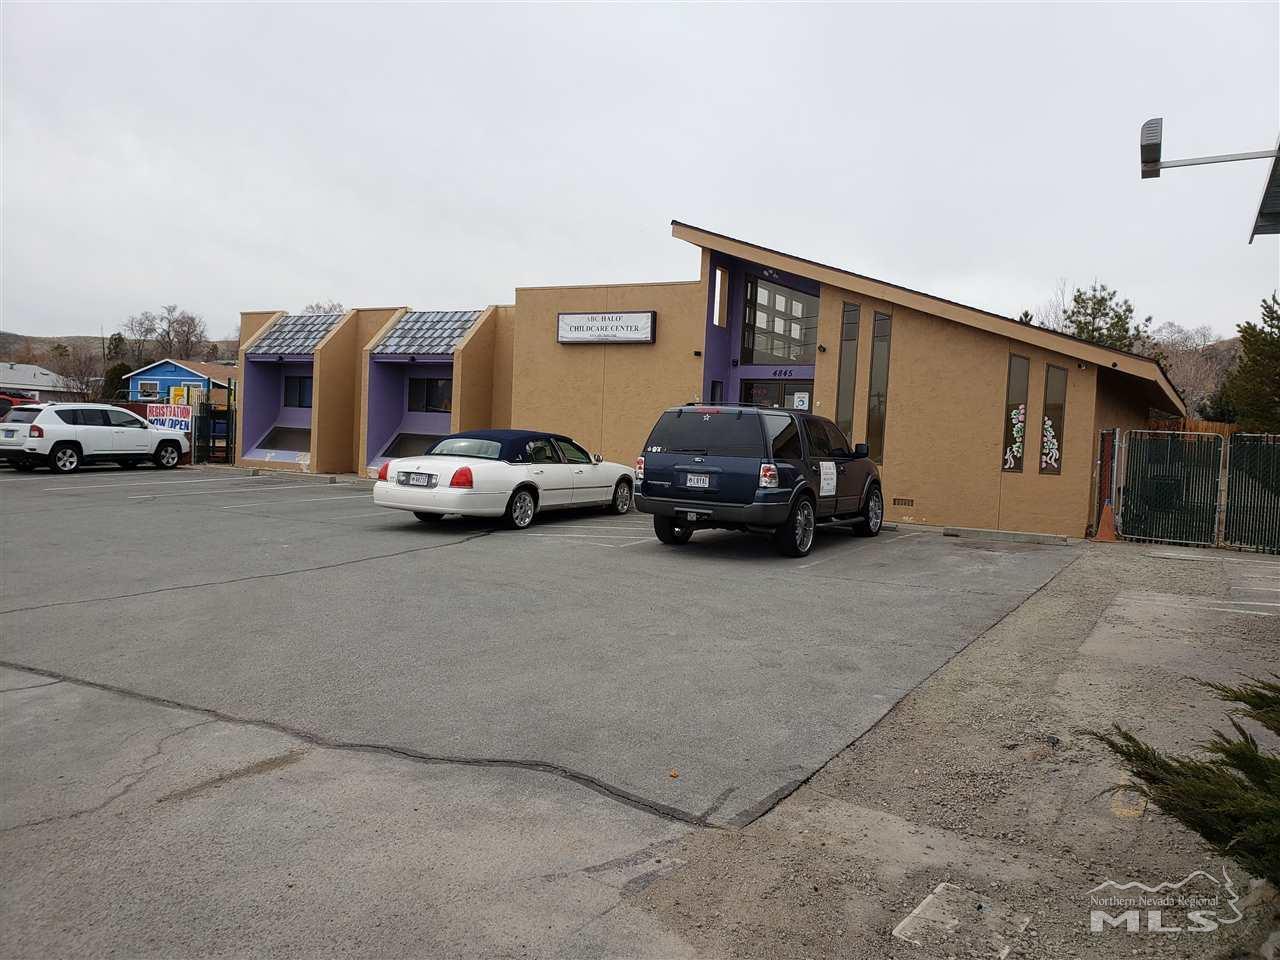 Image for 4845 Sun Valley Blvd, Reno, NV 89433